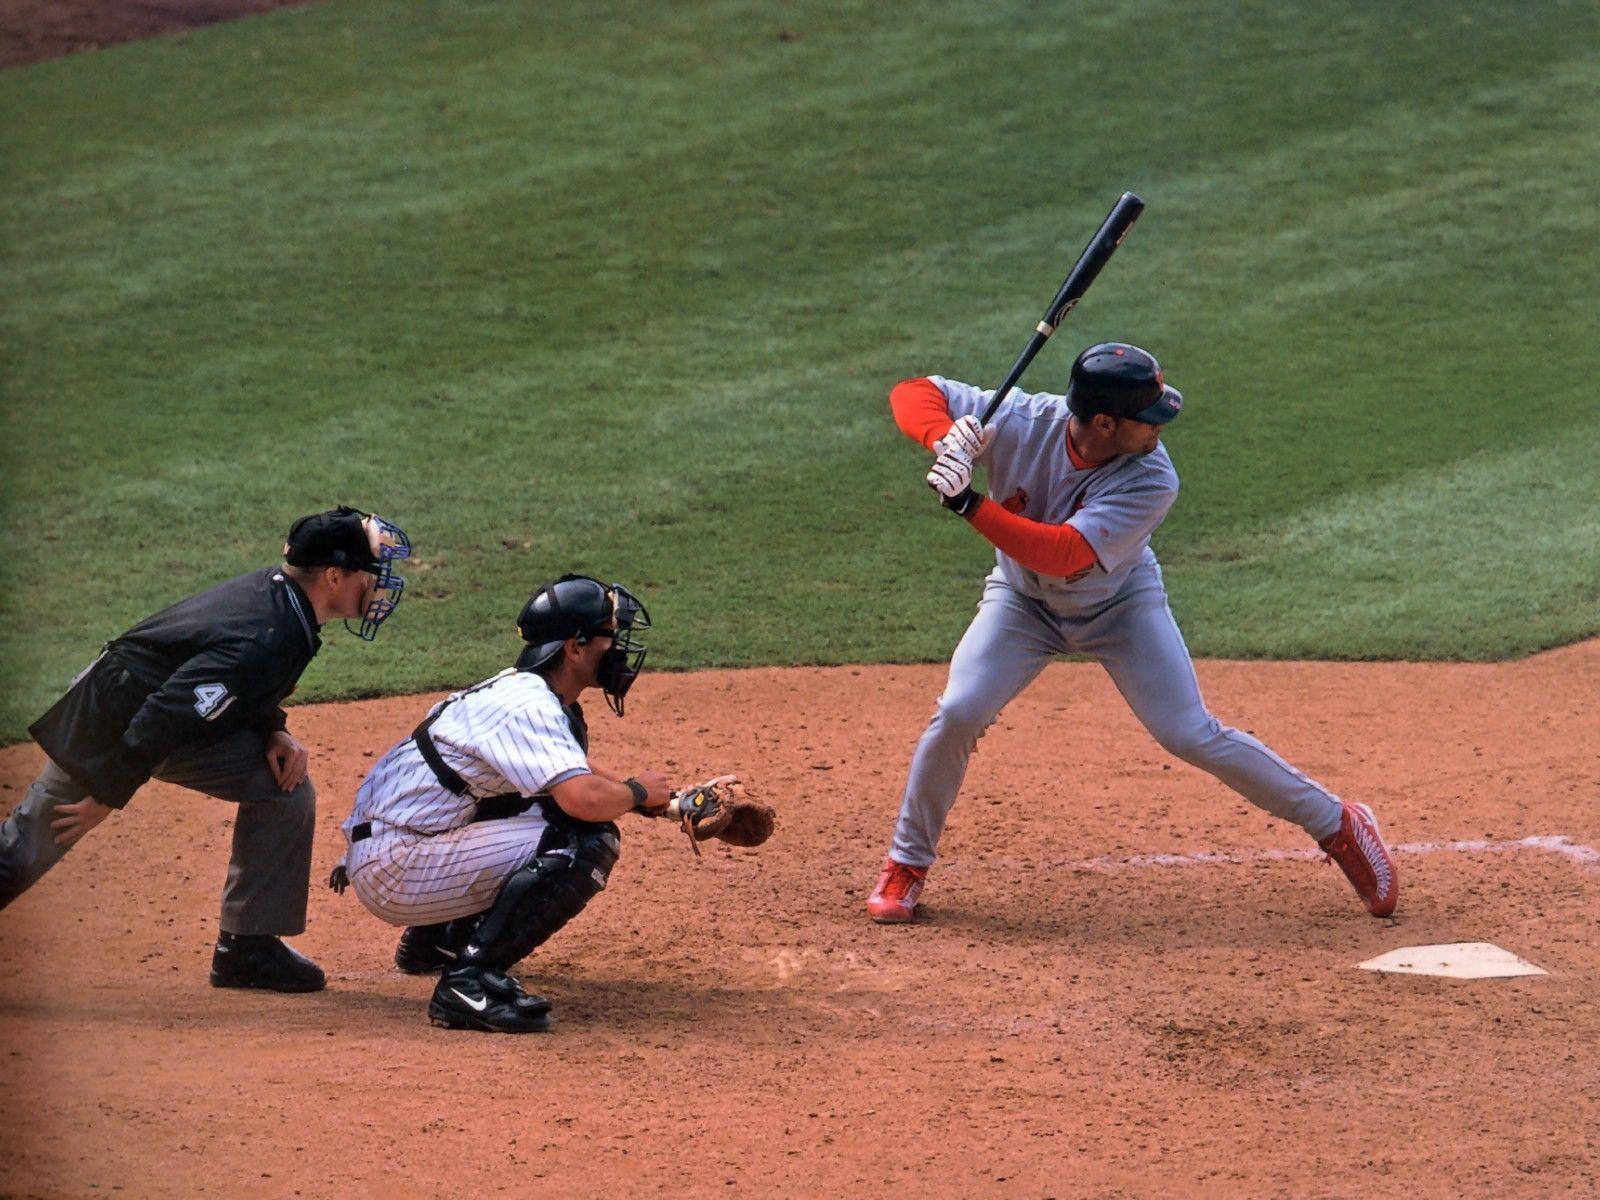 http://4.bp.blogspot.com/-4_pojIJdv2I/TwWm4RwG6wI/AAAAAAAABHI/DY34fmKfrIY/s1600/Baseball+Wallpaper+3.jpg